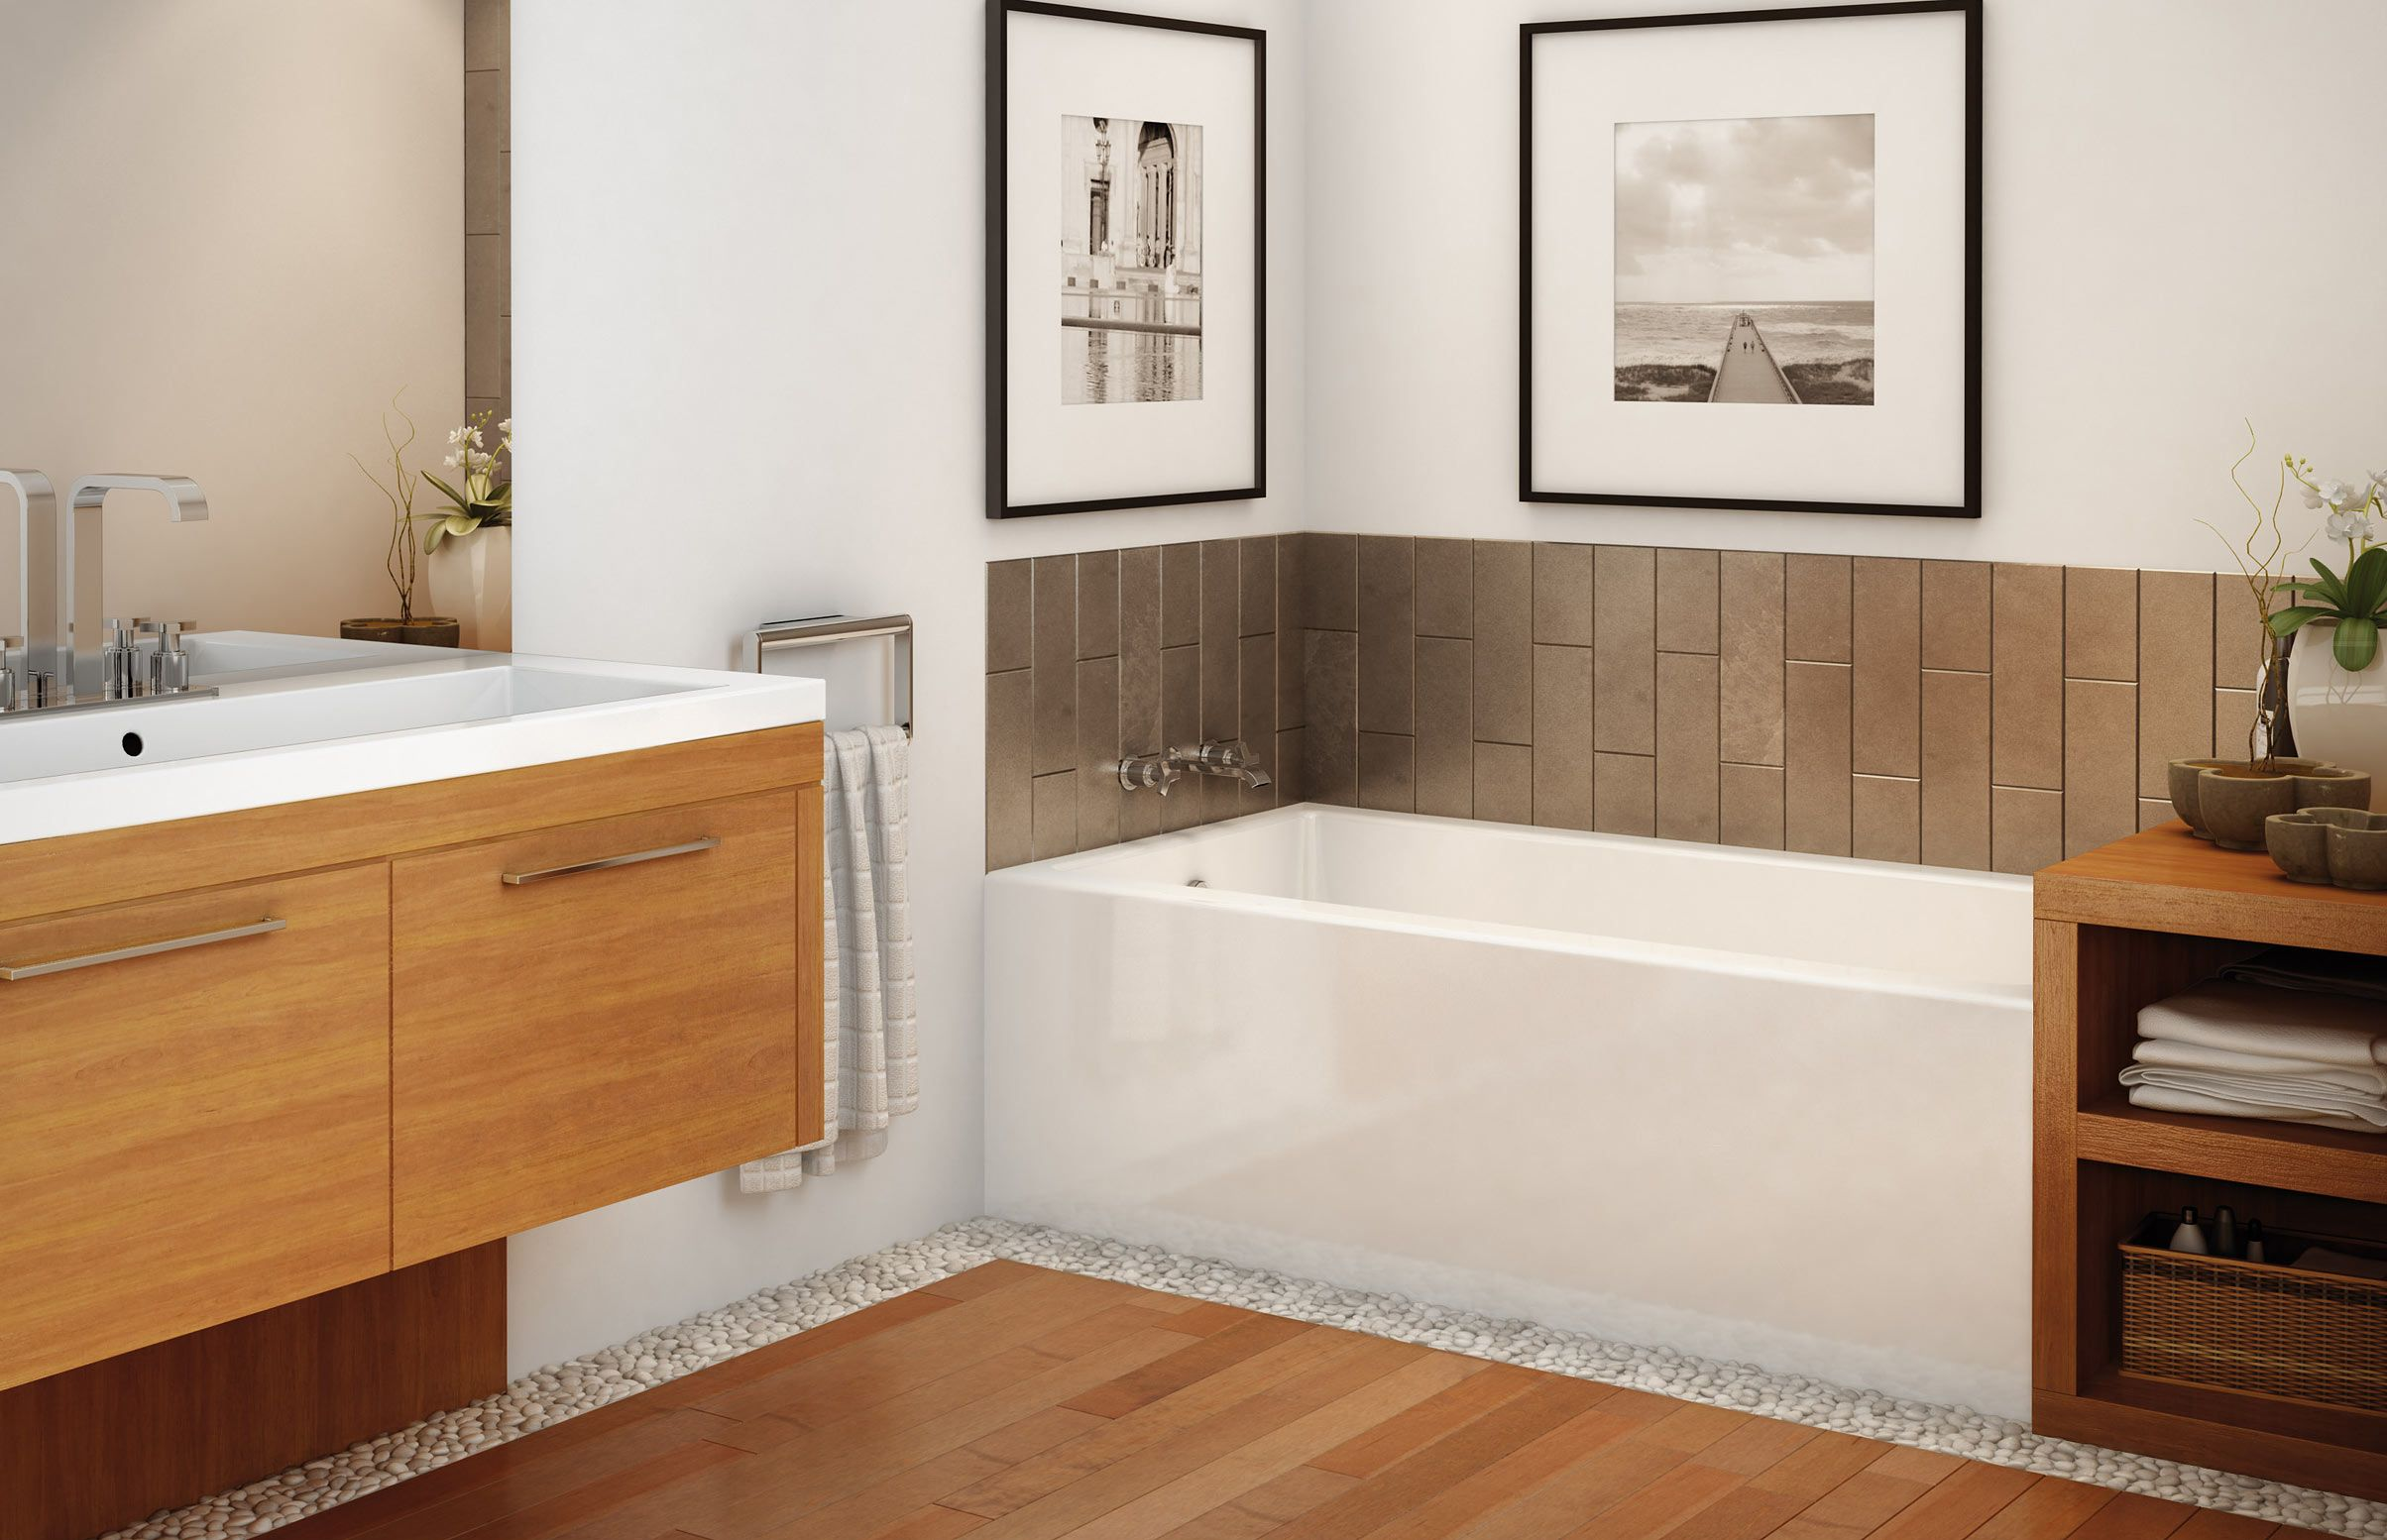 Guest Bathroom Bathtub | Rubix 6030 Alcove bathtub - MAAX ...